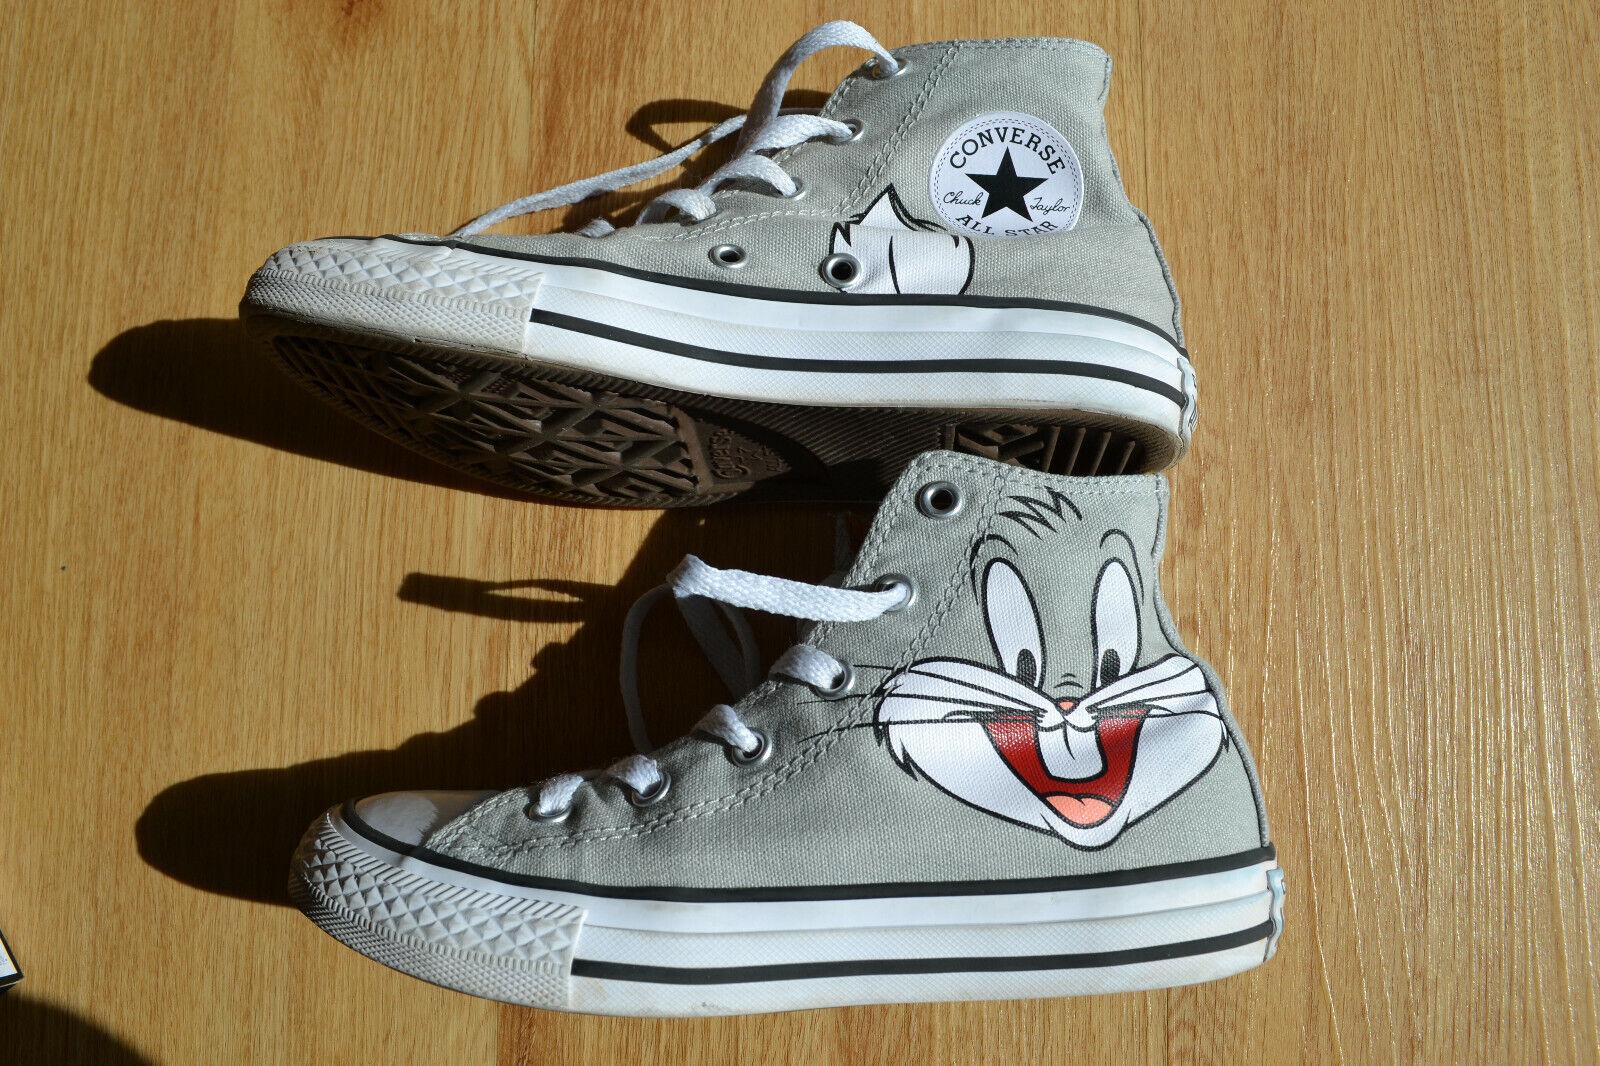 Converse Chucks High Looney Tunes - Bugs Bunny - Gr. 33 EUR Schuhe mit Karton